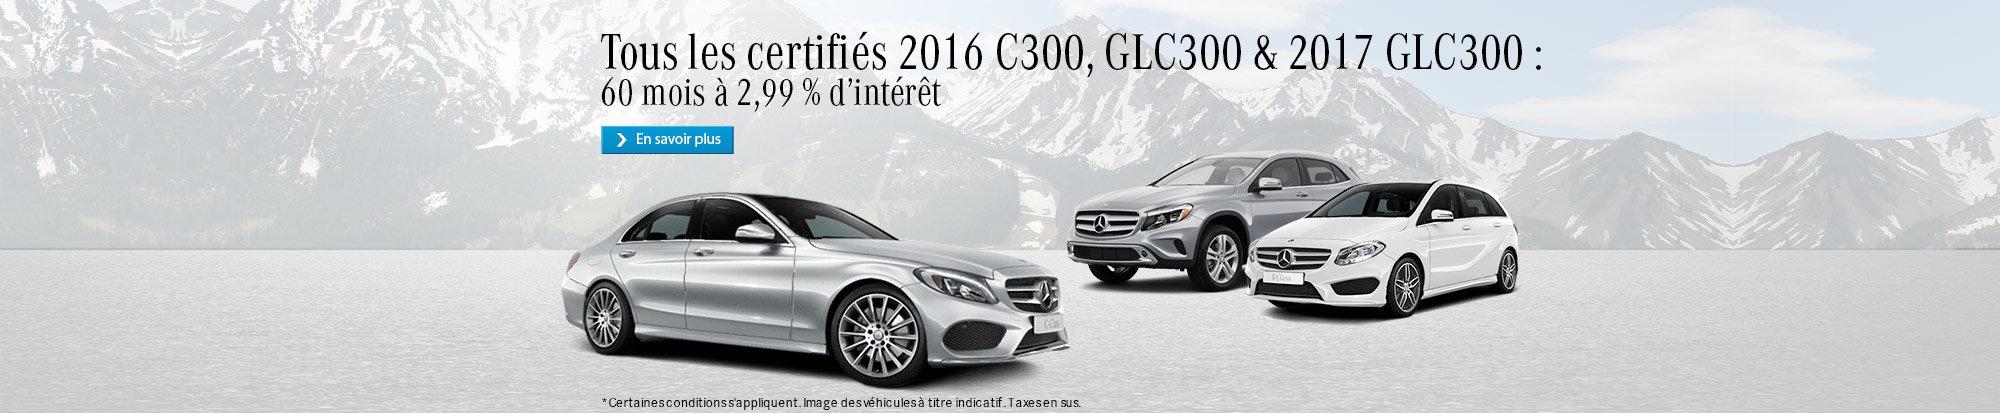 Véhicules certifiés Mercedes-Benz